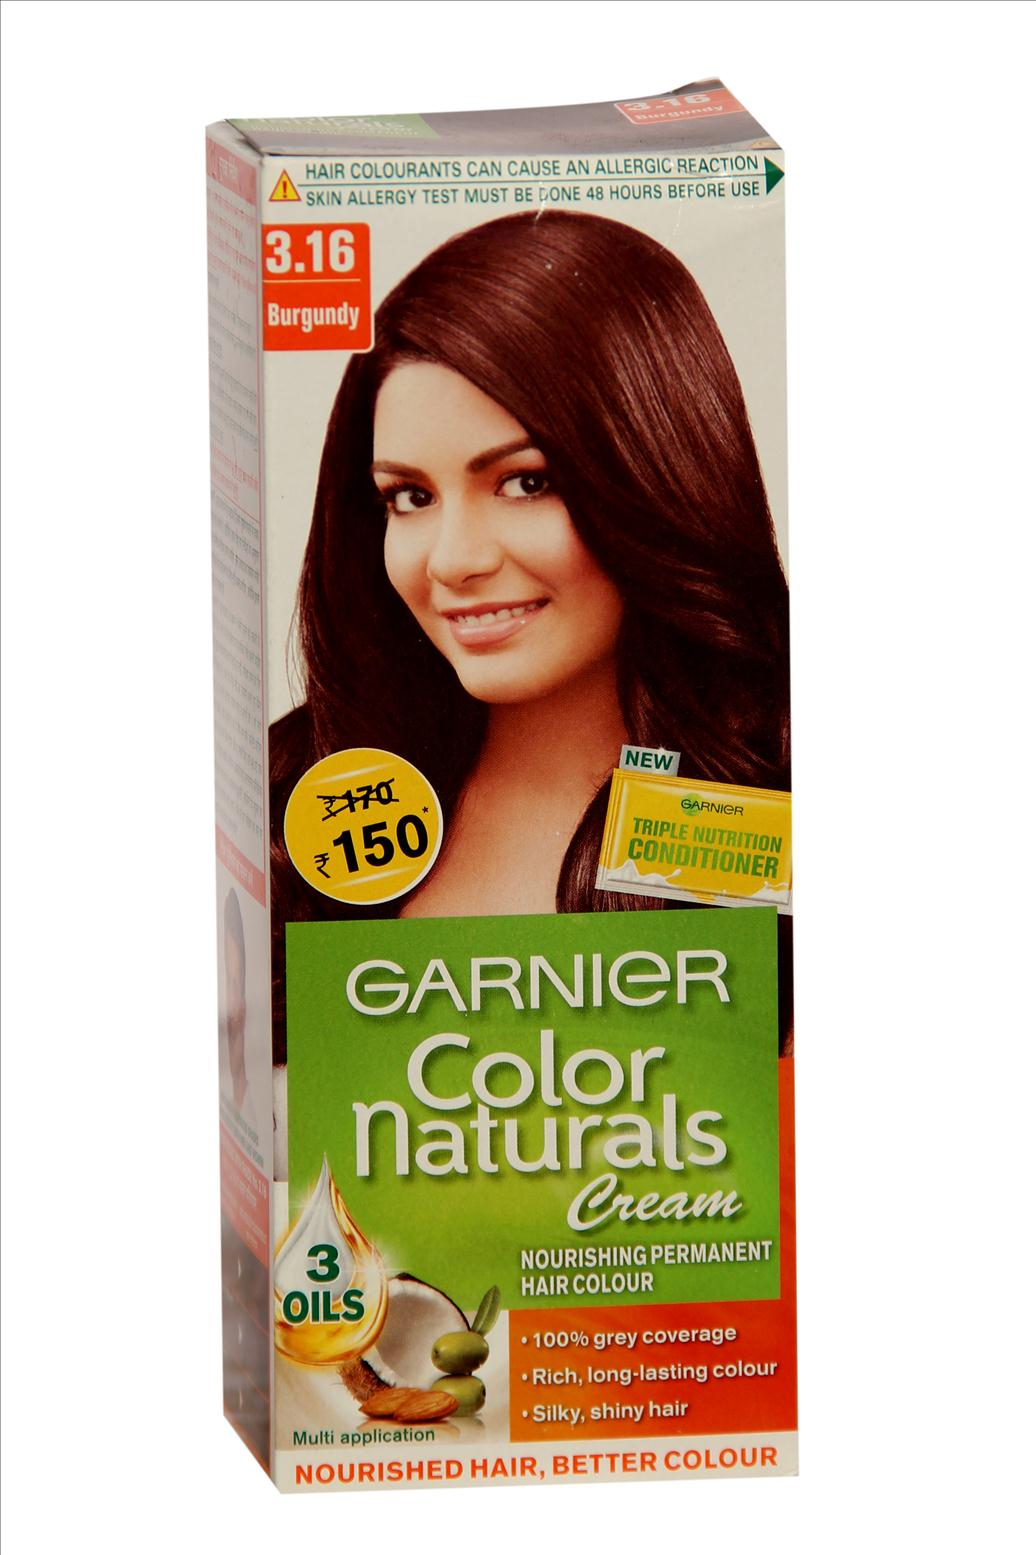 Garnier Color Naturals No.3.16 Burgundy Hair Colour